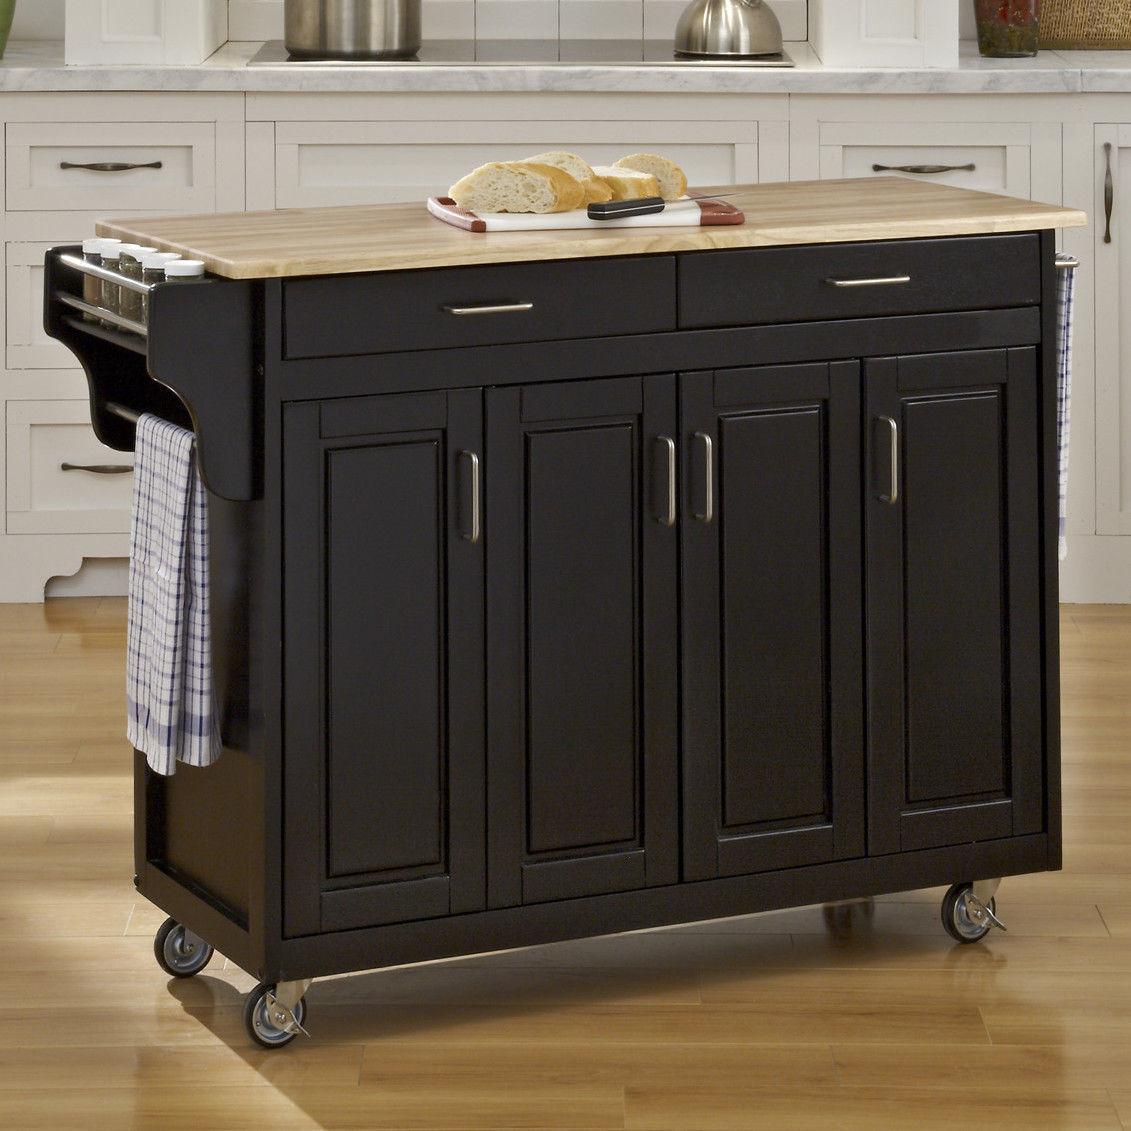 kitchen island wheels free standing sink unit carts on john boos endgrain butcher block